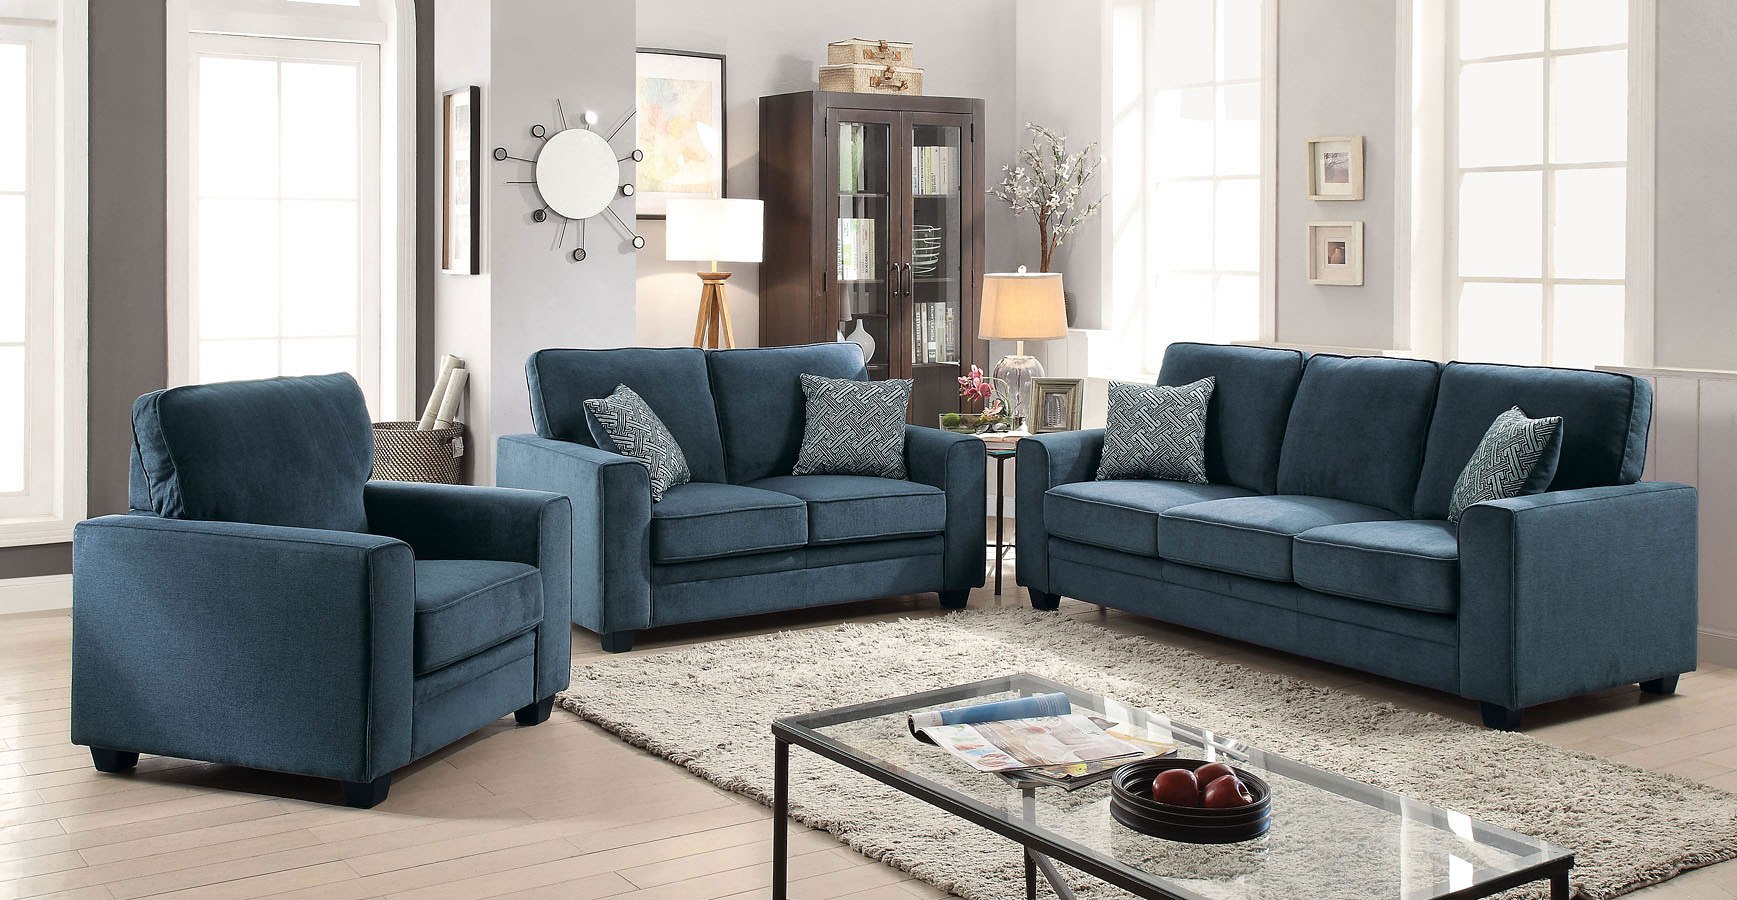 Catherine Living Room Set (Blue) by Acme Furniture | FurniturePick